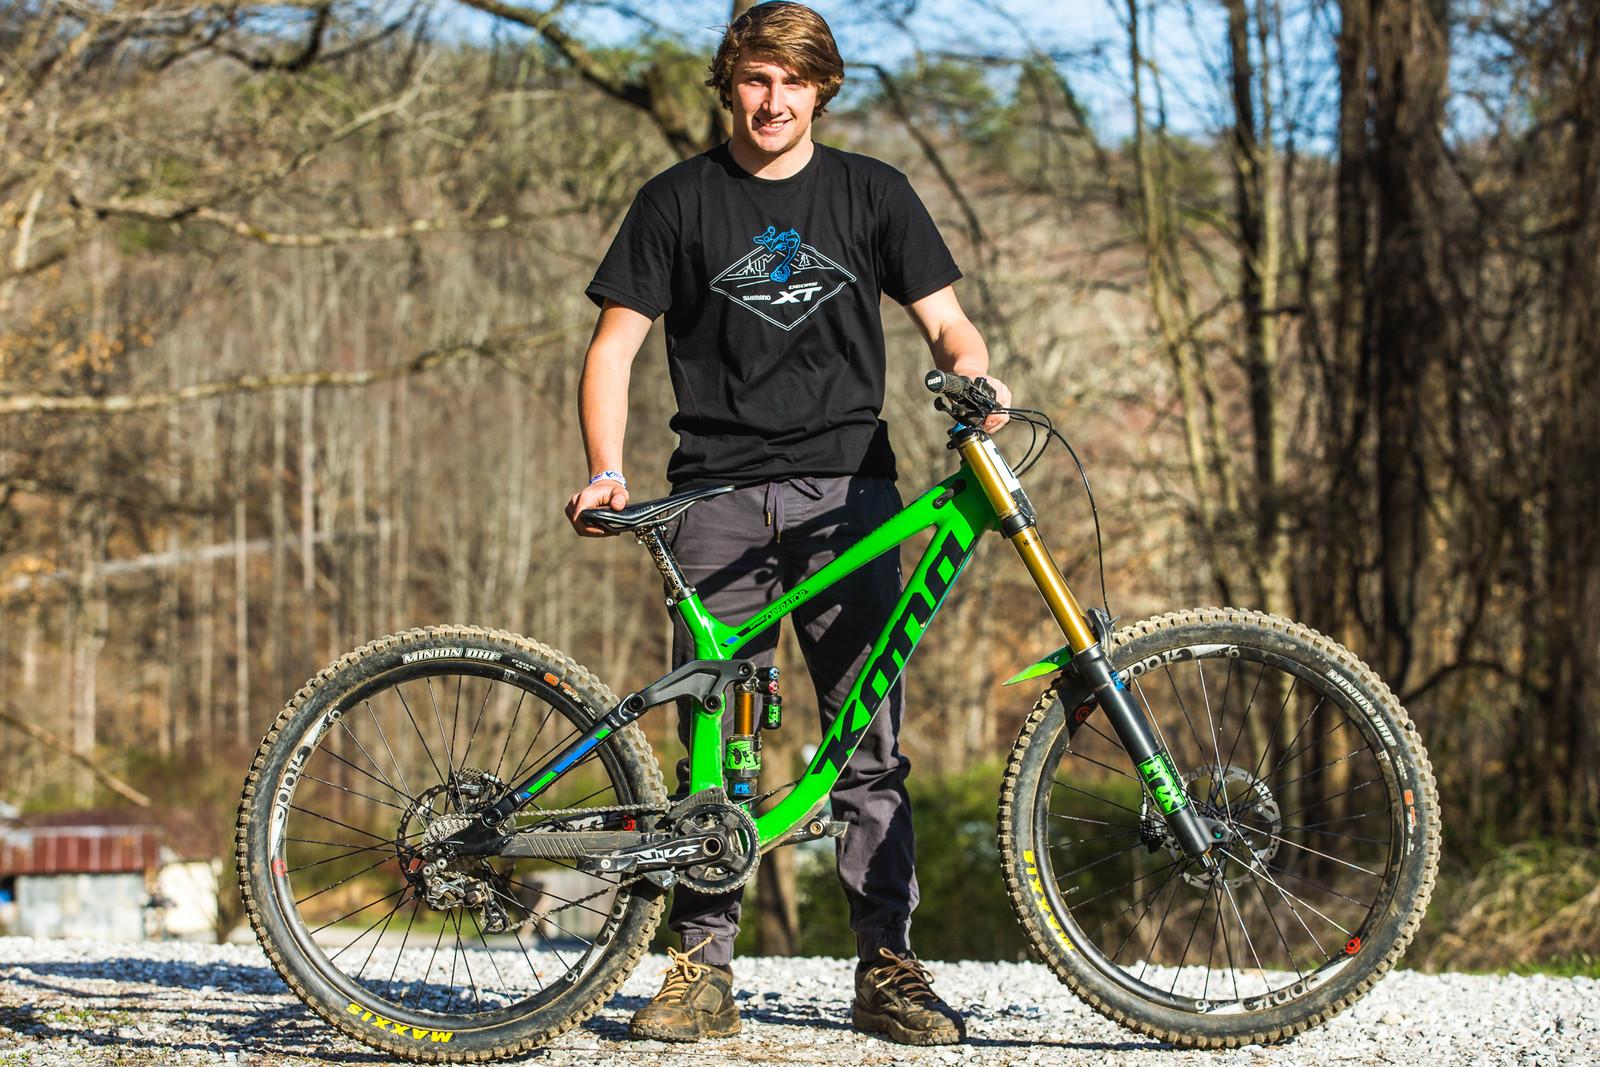 Pro GRT Pro Bike - Nate St. Claire's Kona Supreme Operator - Pro Bikes from Windrock Pro GRT - Mountain Biking Pictures - Vital MTB